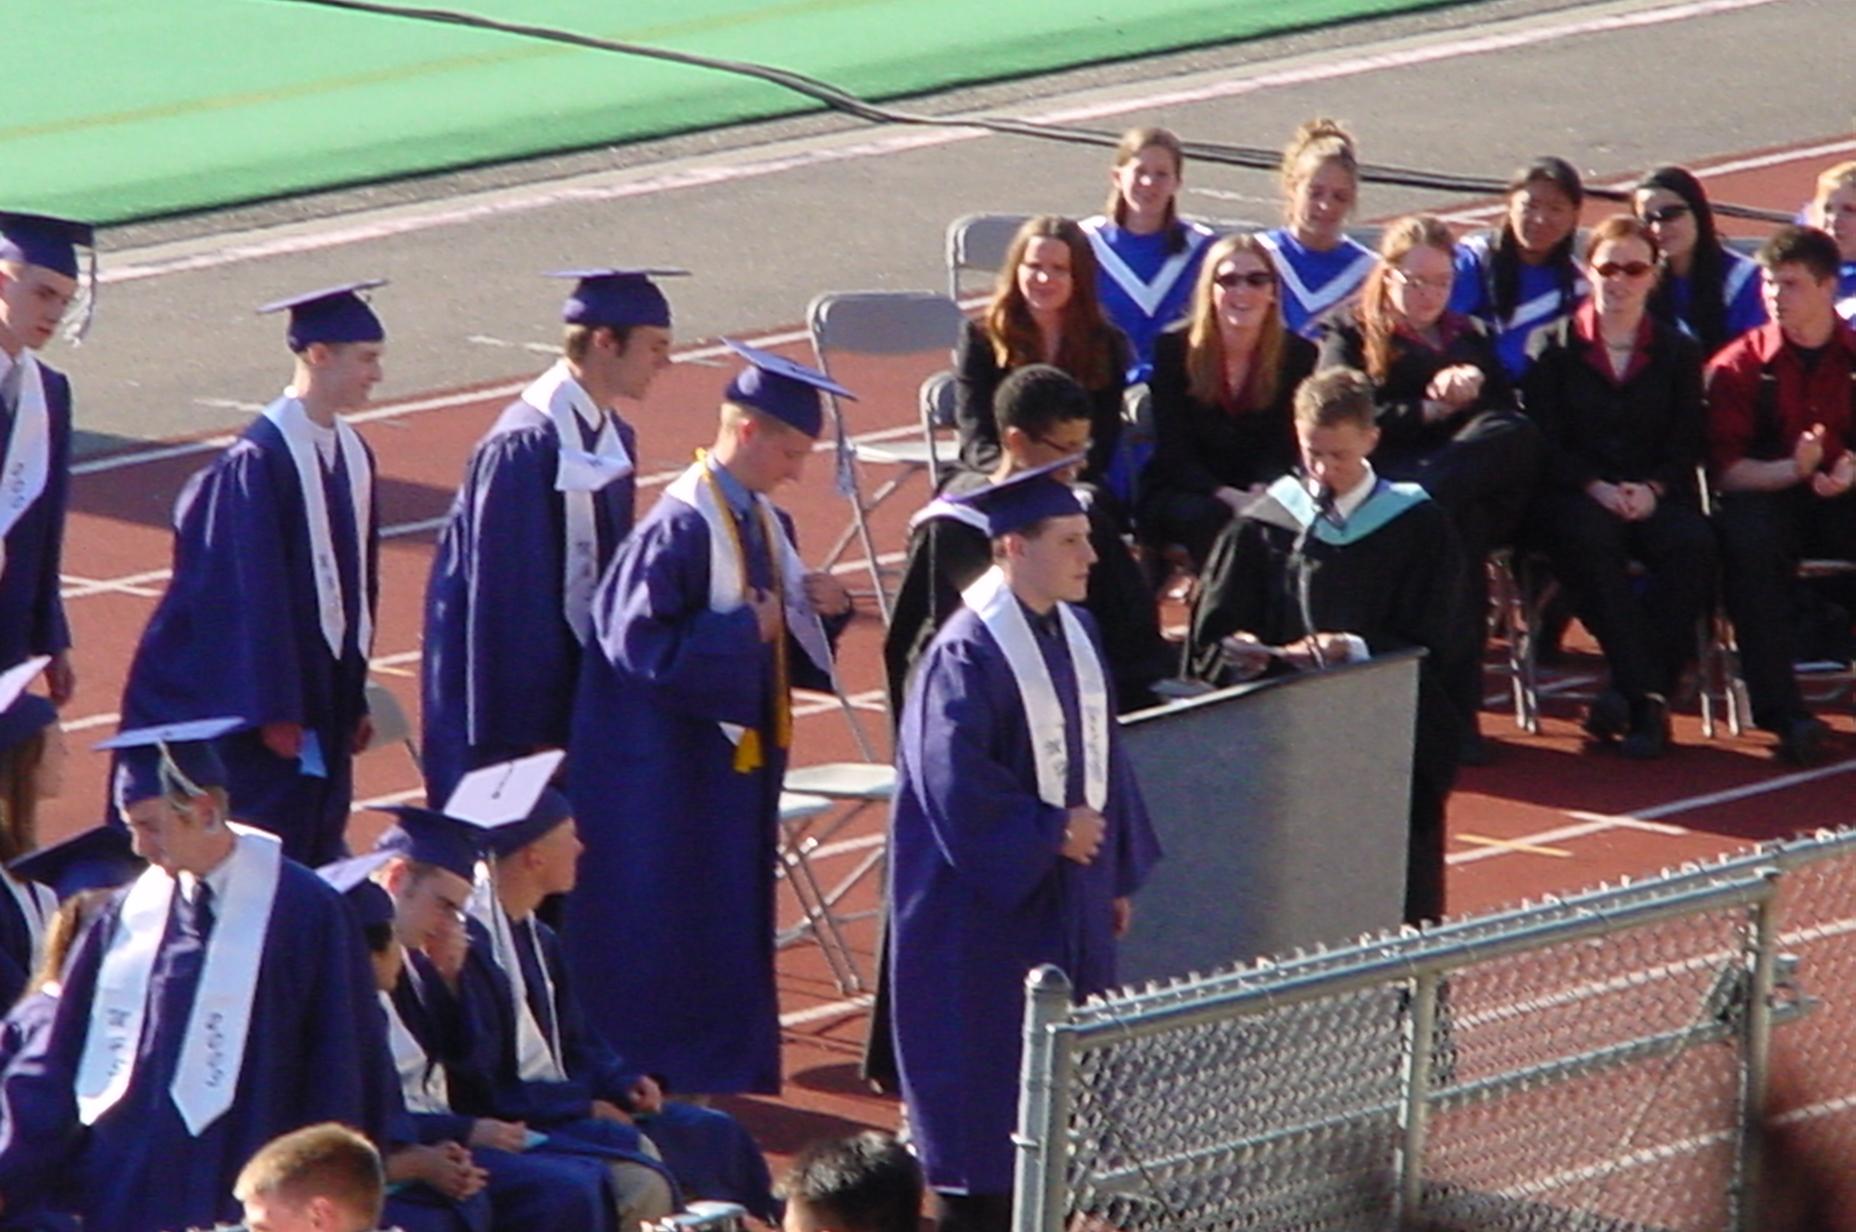 Nancy's older son, Jeff, graduating from Meadowdale High.